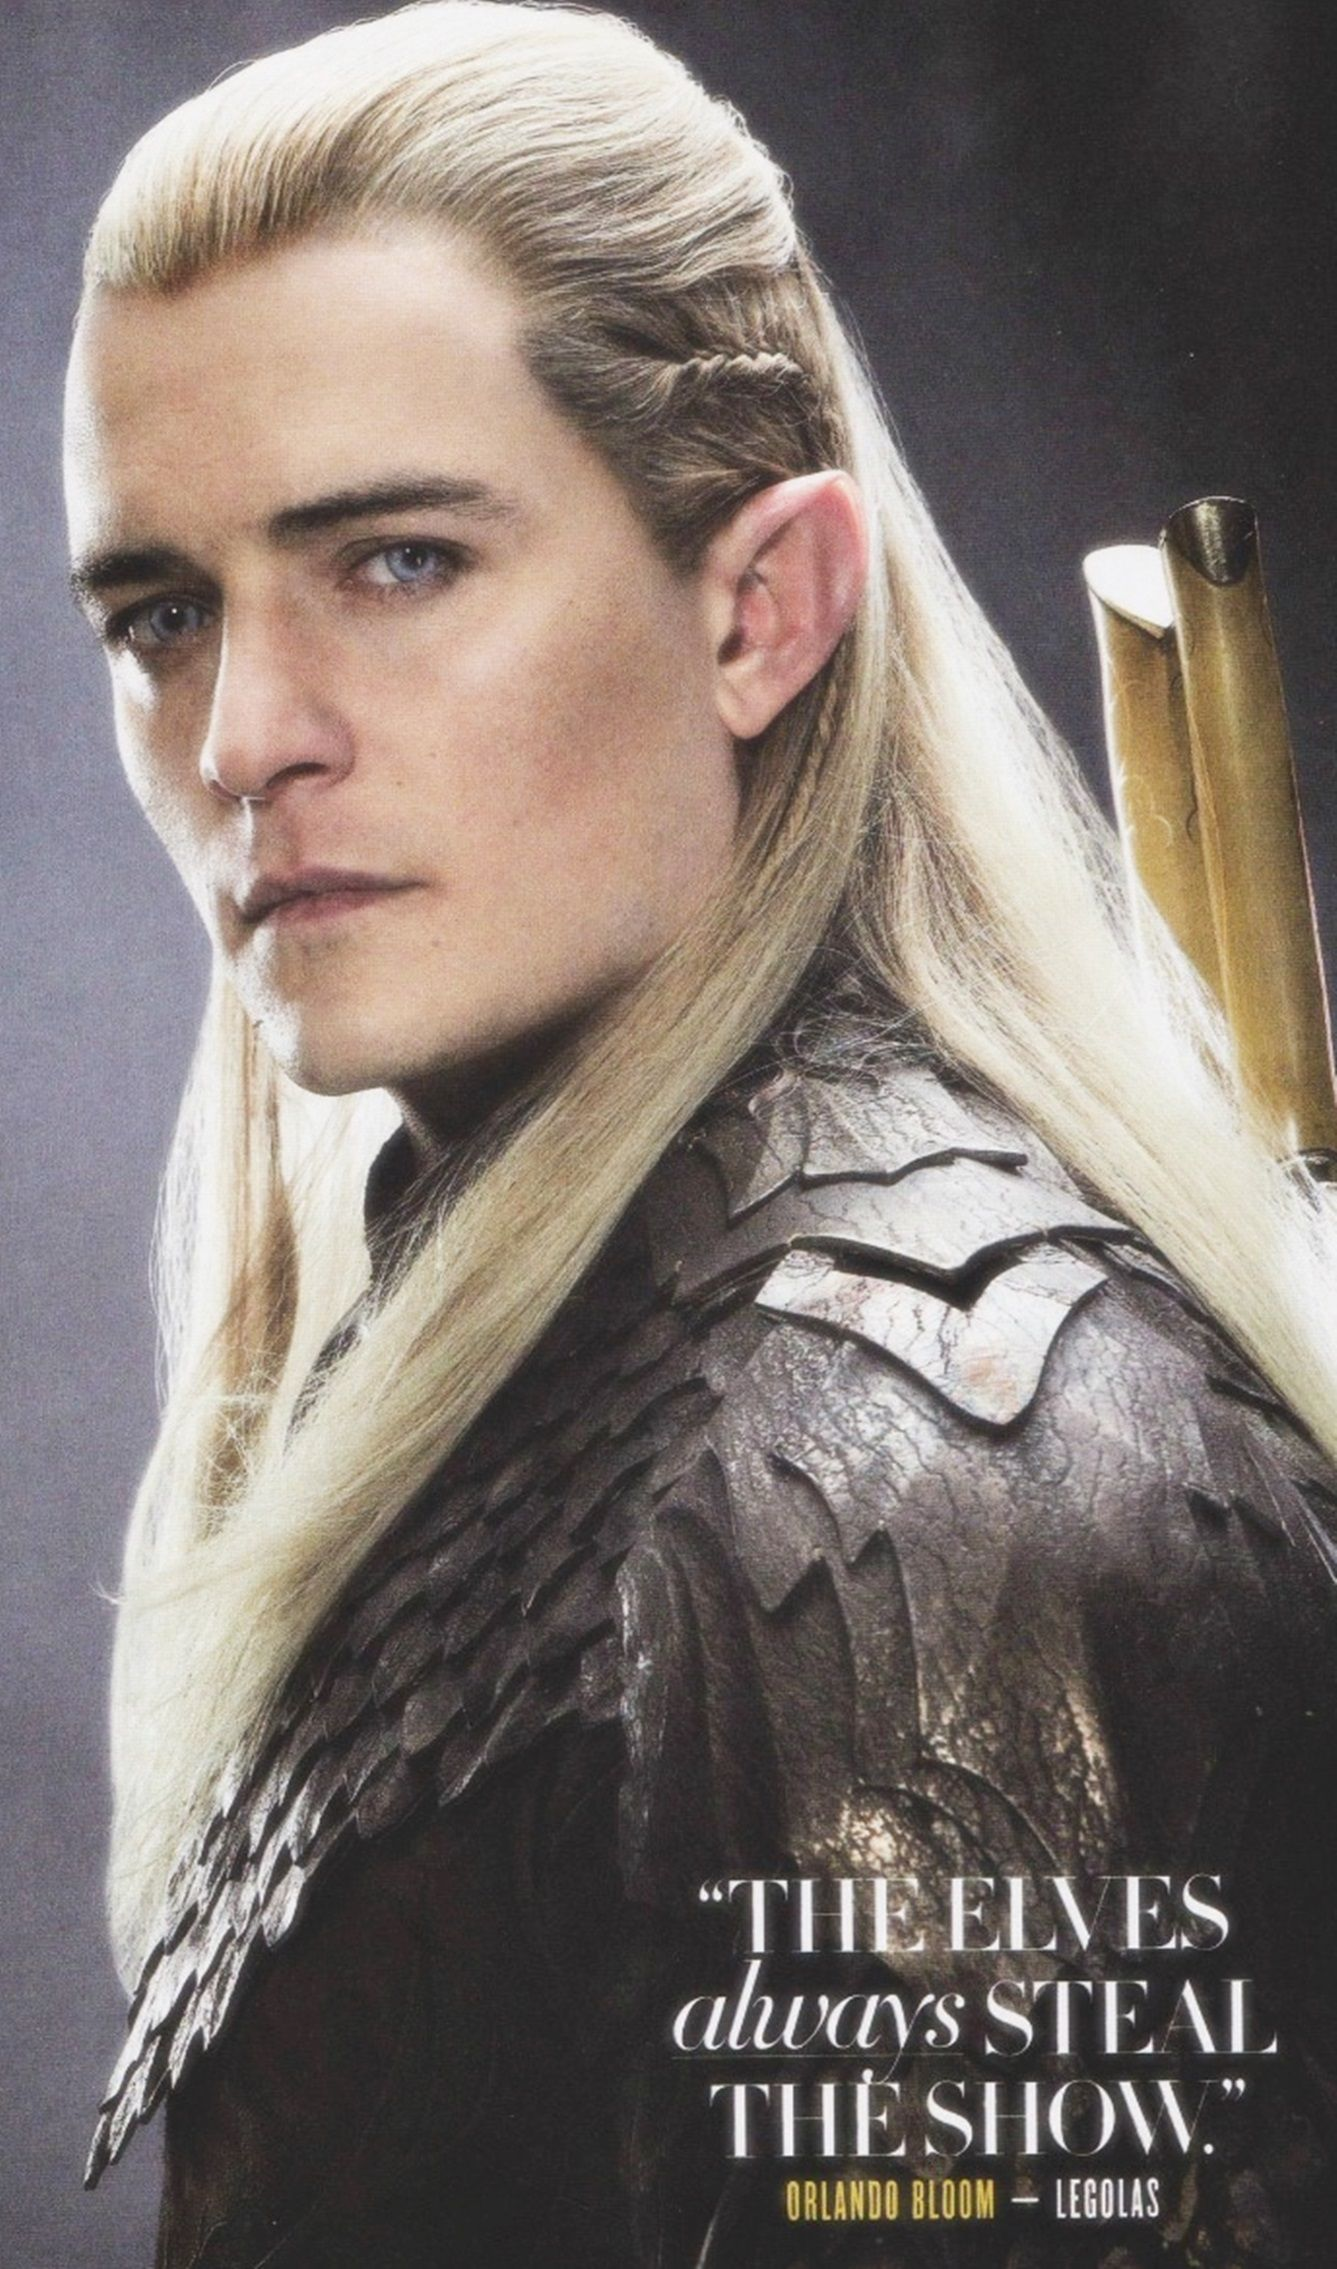 Orlando bloom 2018 the hobbit